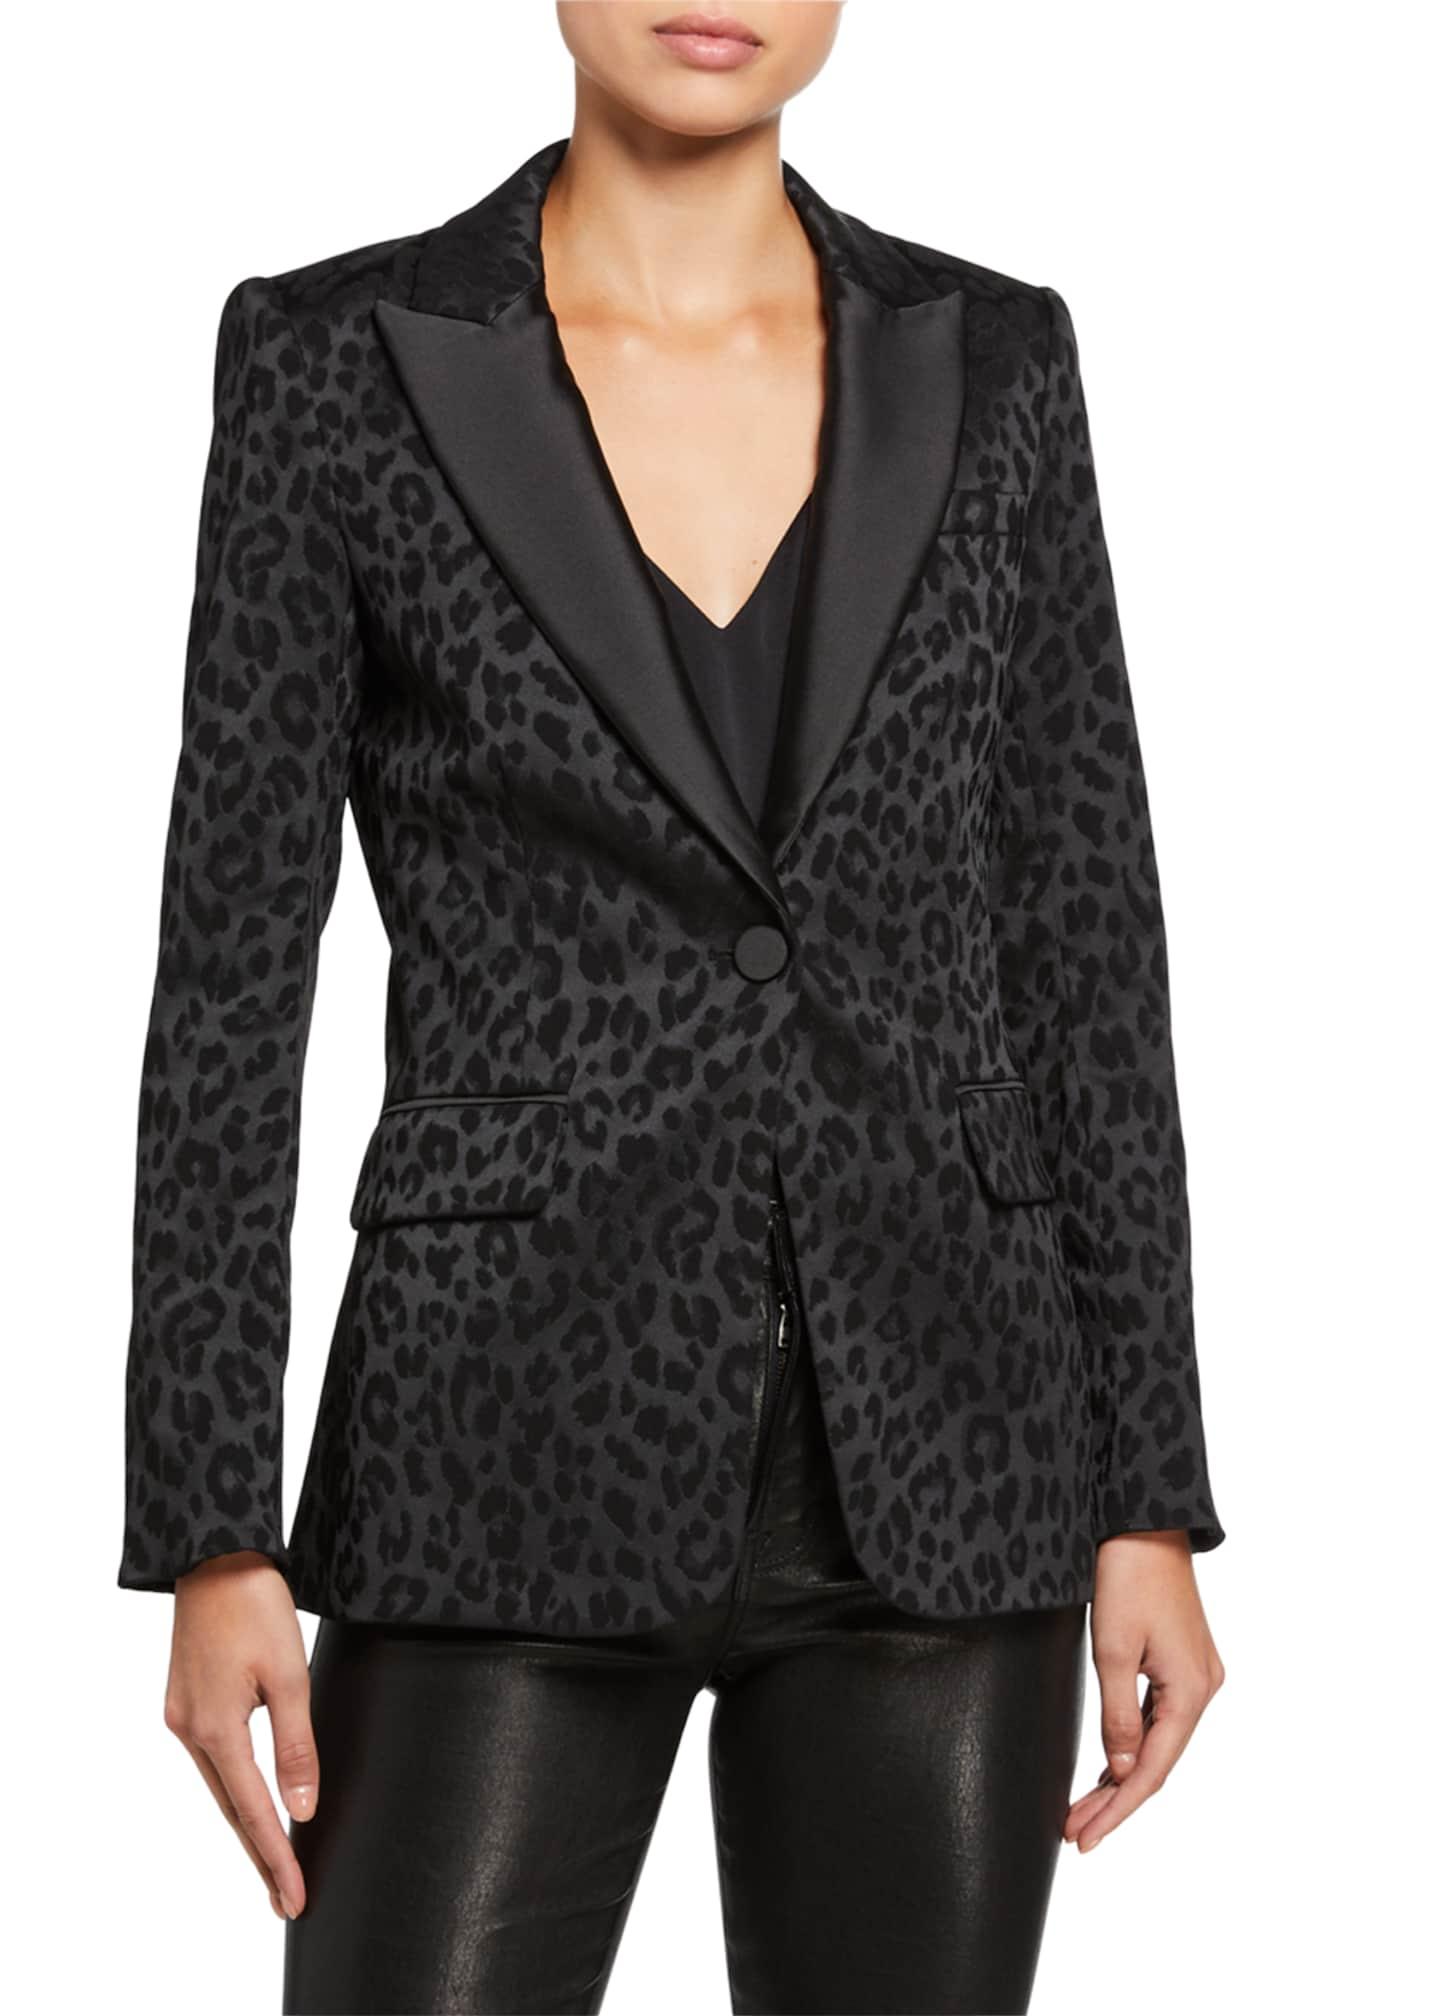 Veronica Beard Ashburn Leopard-Print Dickey Jacket